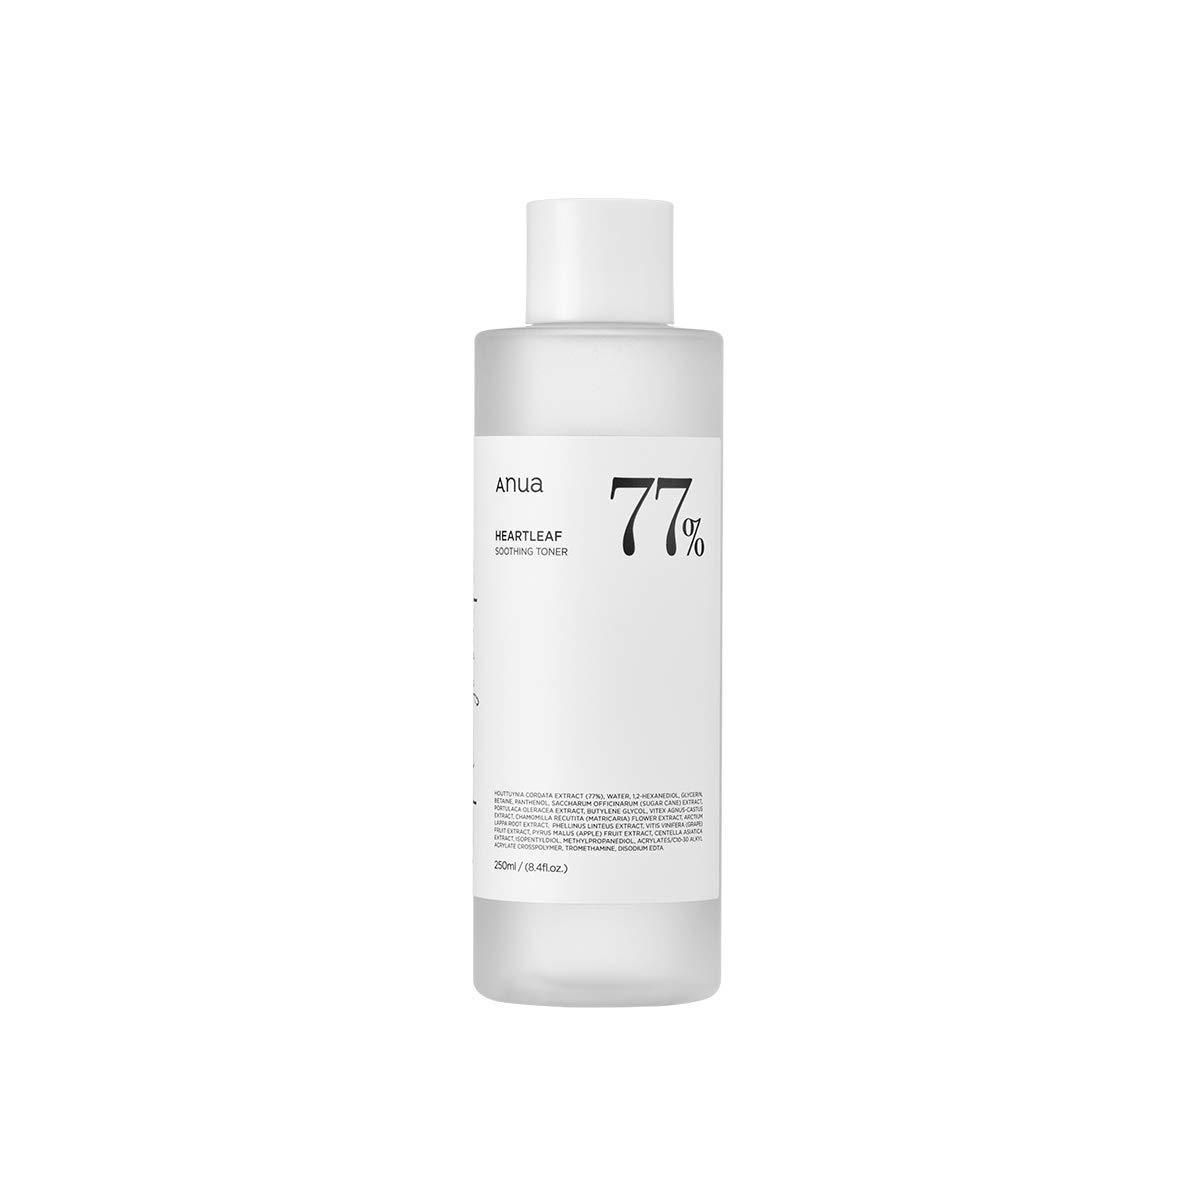 Anua Heartleaf 77% Soothing Toner I pH 5.5 Skin Trouble Care, Calming Skin, Refreshing, Purifying (250ml / 8.45 fl.oz.)